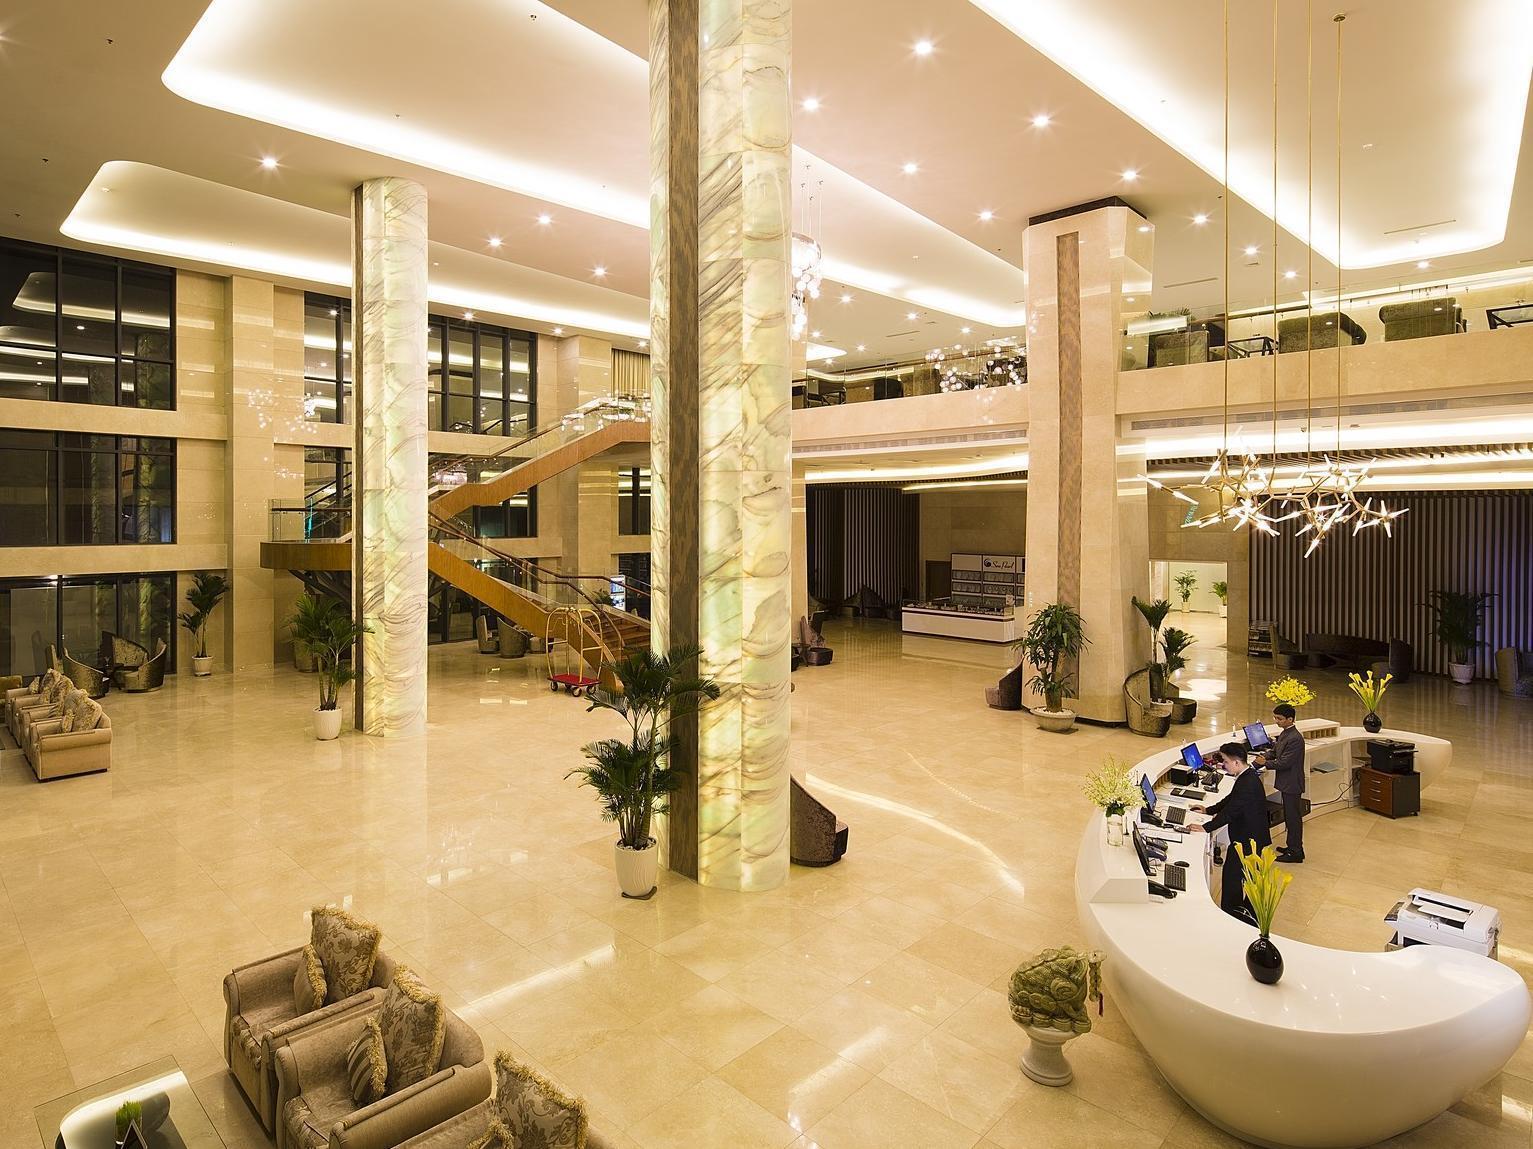 Фотография отеля Muong Thanh Luxury Nha Trang Hotel 5*